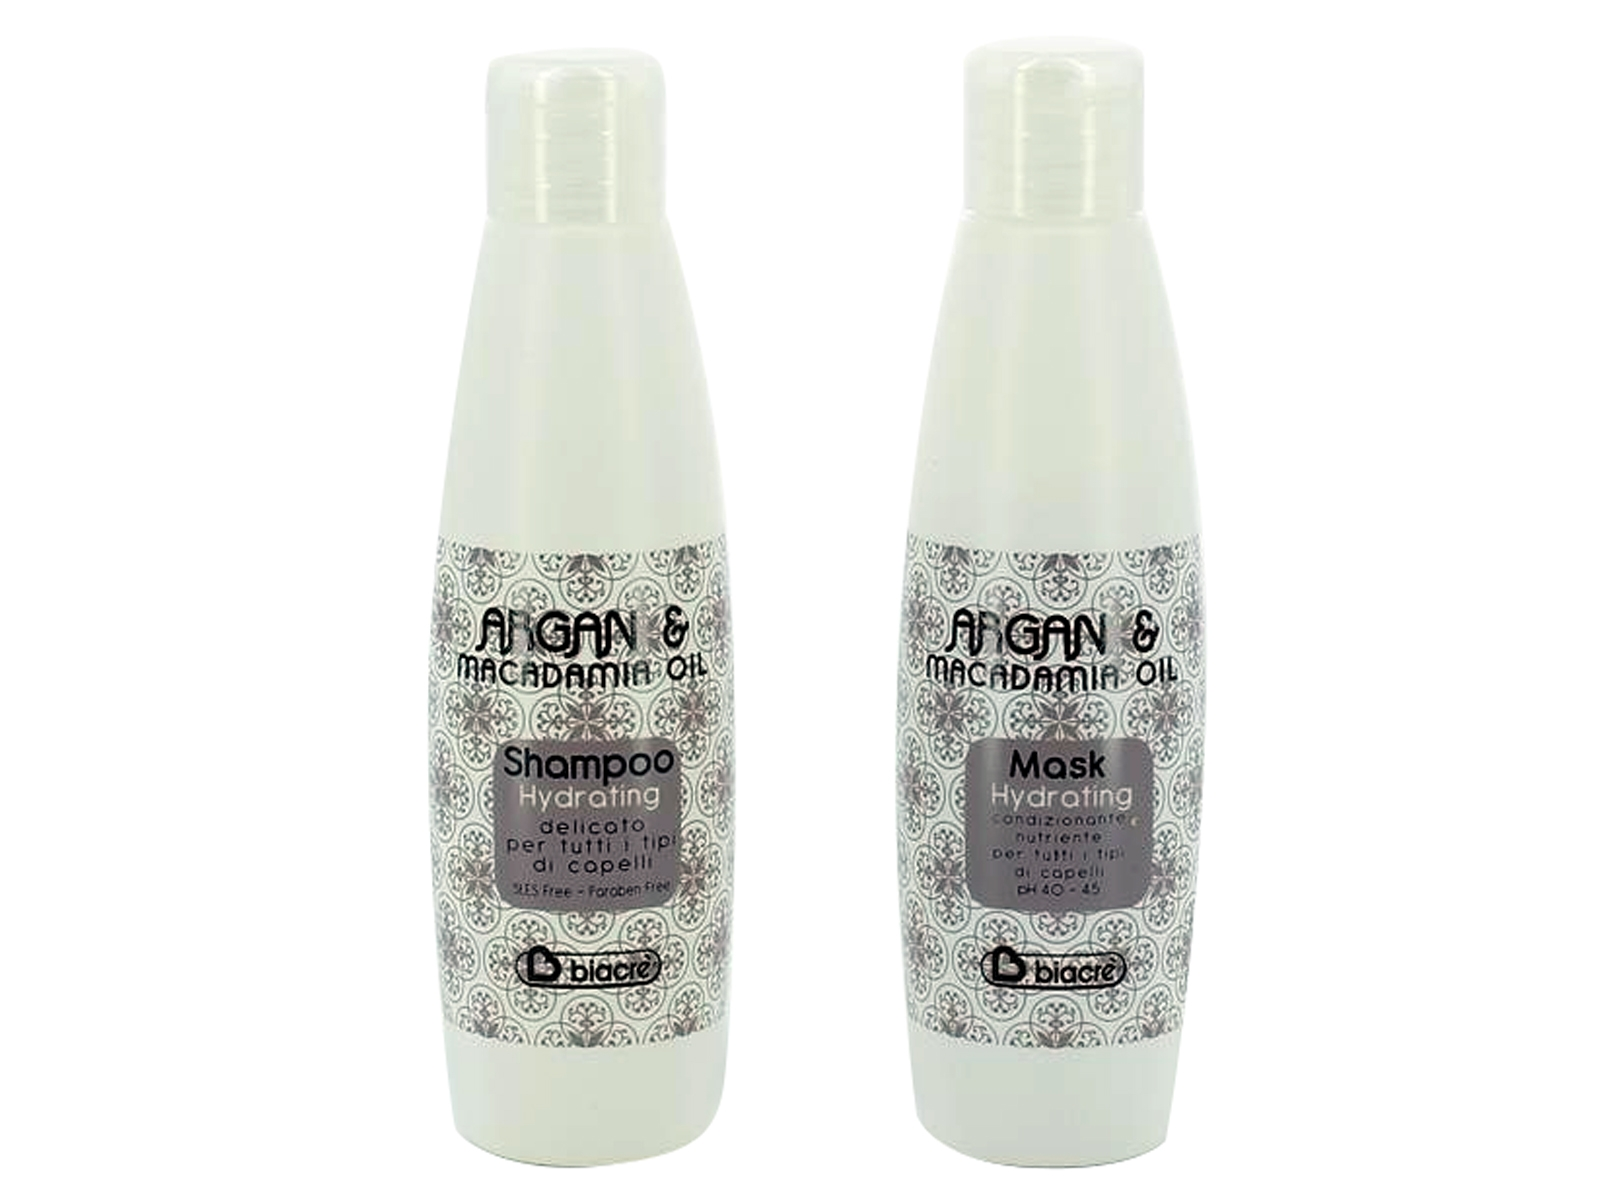 Kit Argan & Macadamia Shampoo e Maschera 2 x 100 ml